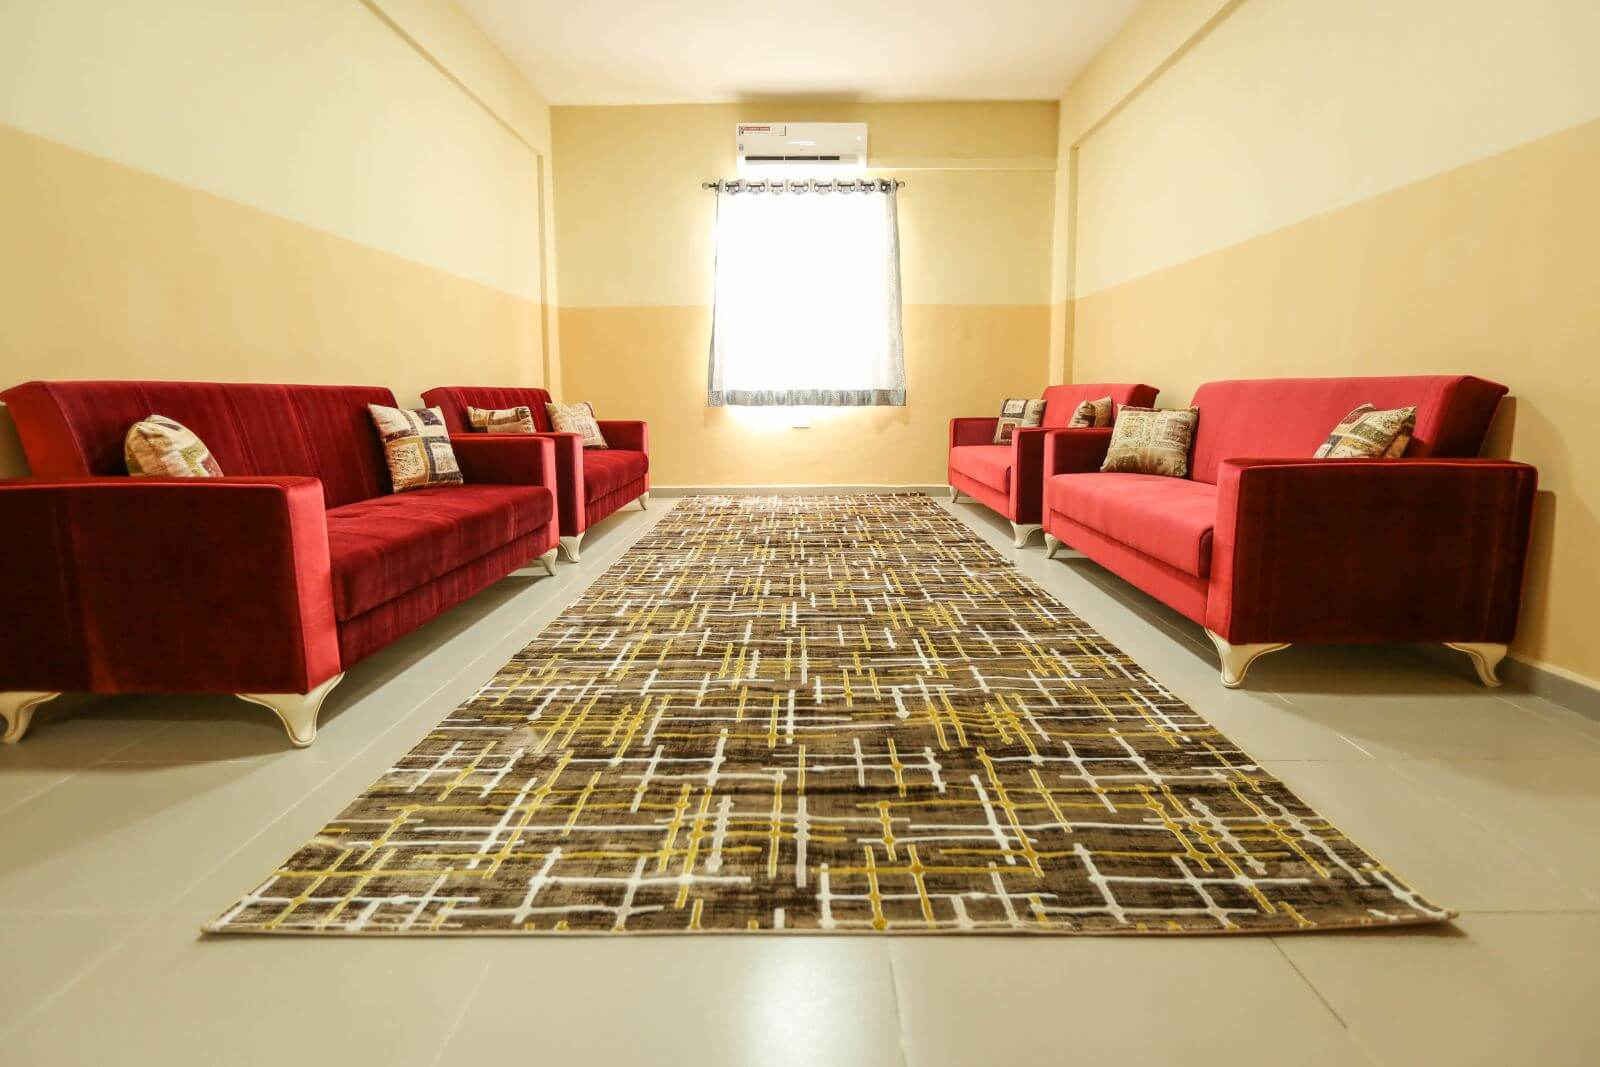 hostel-accomodation